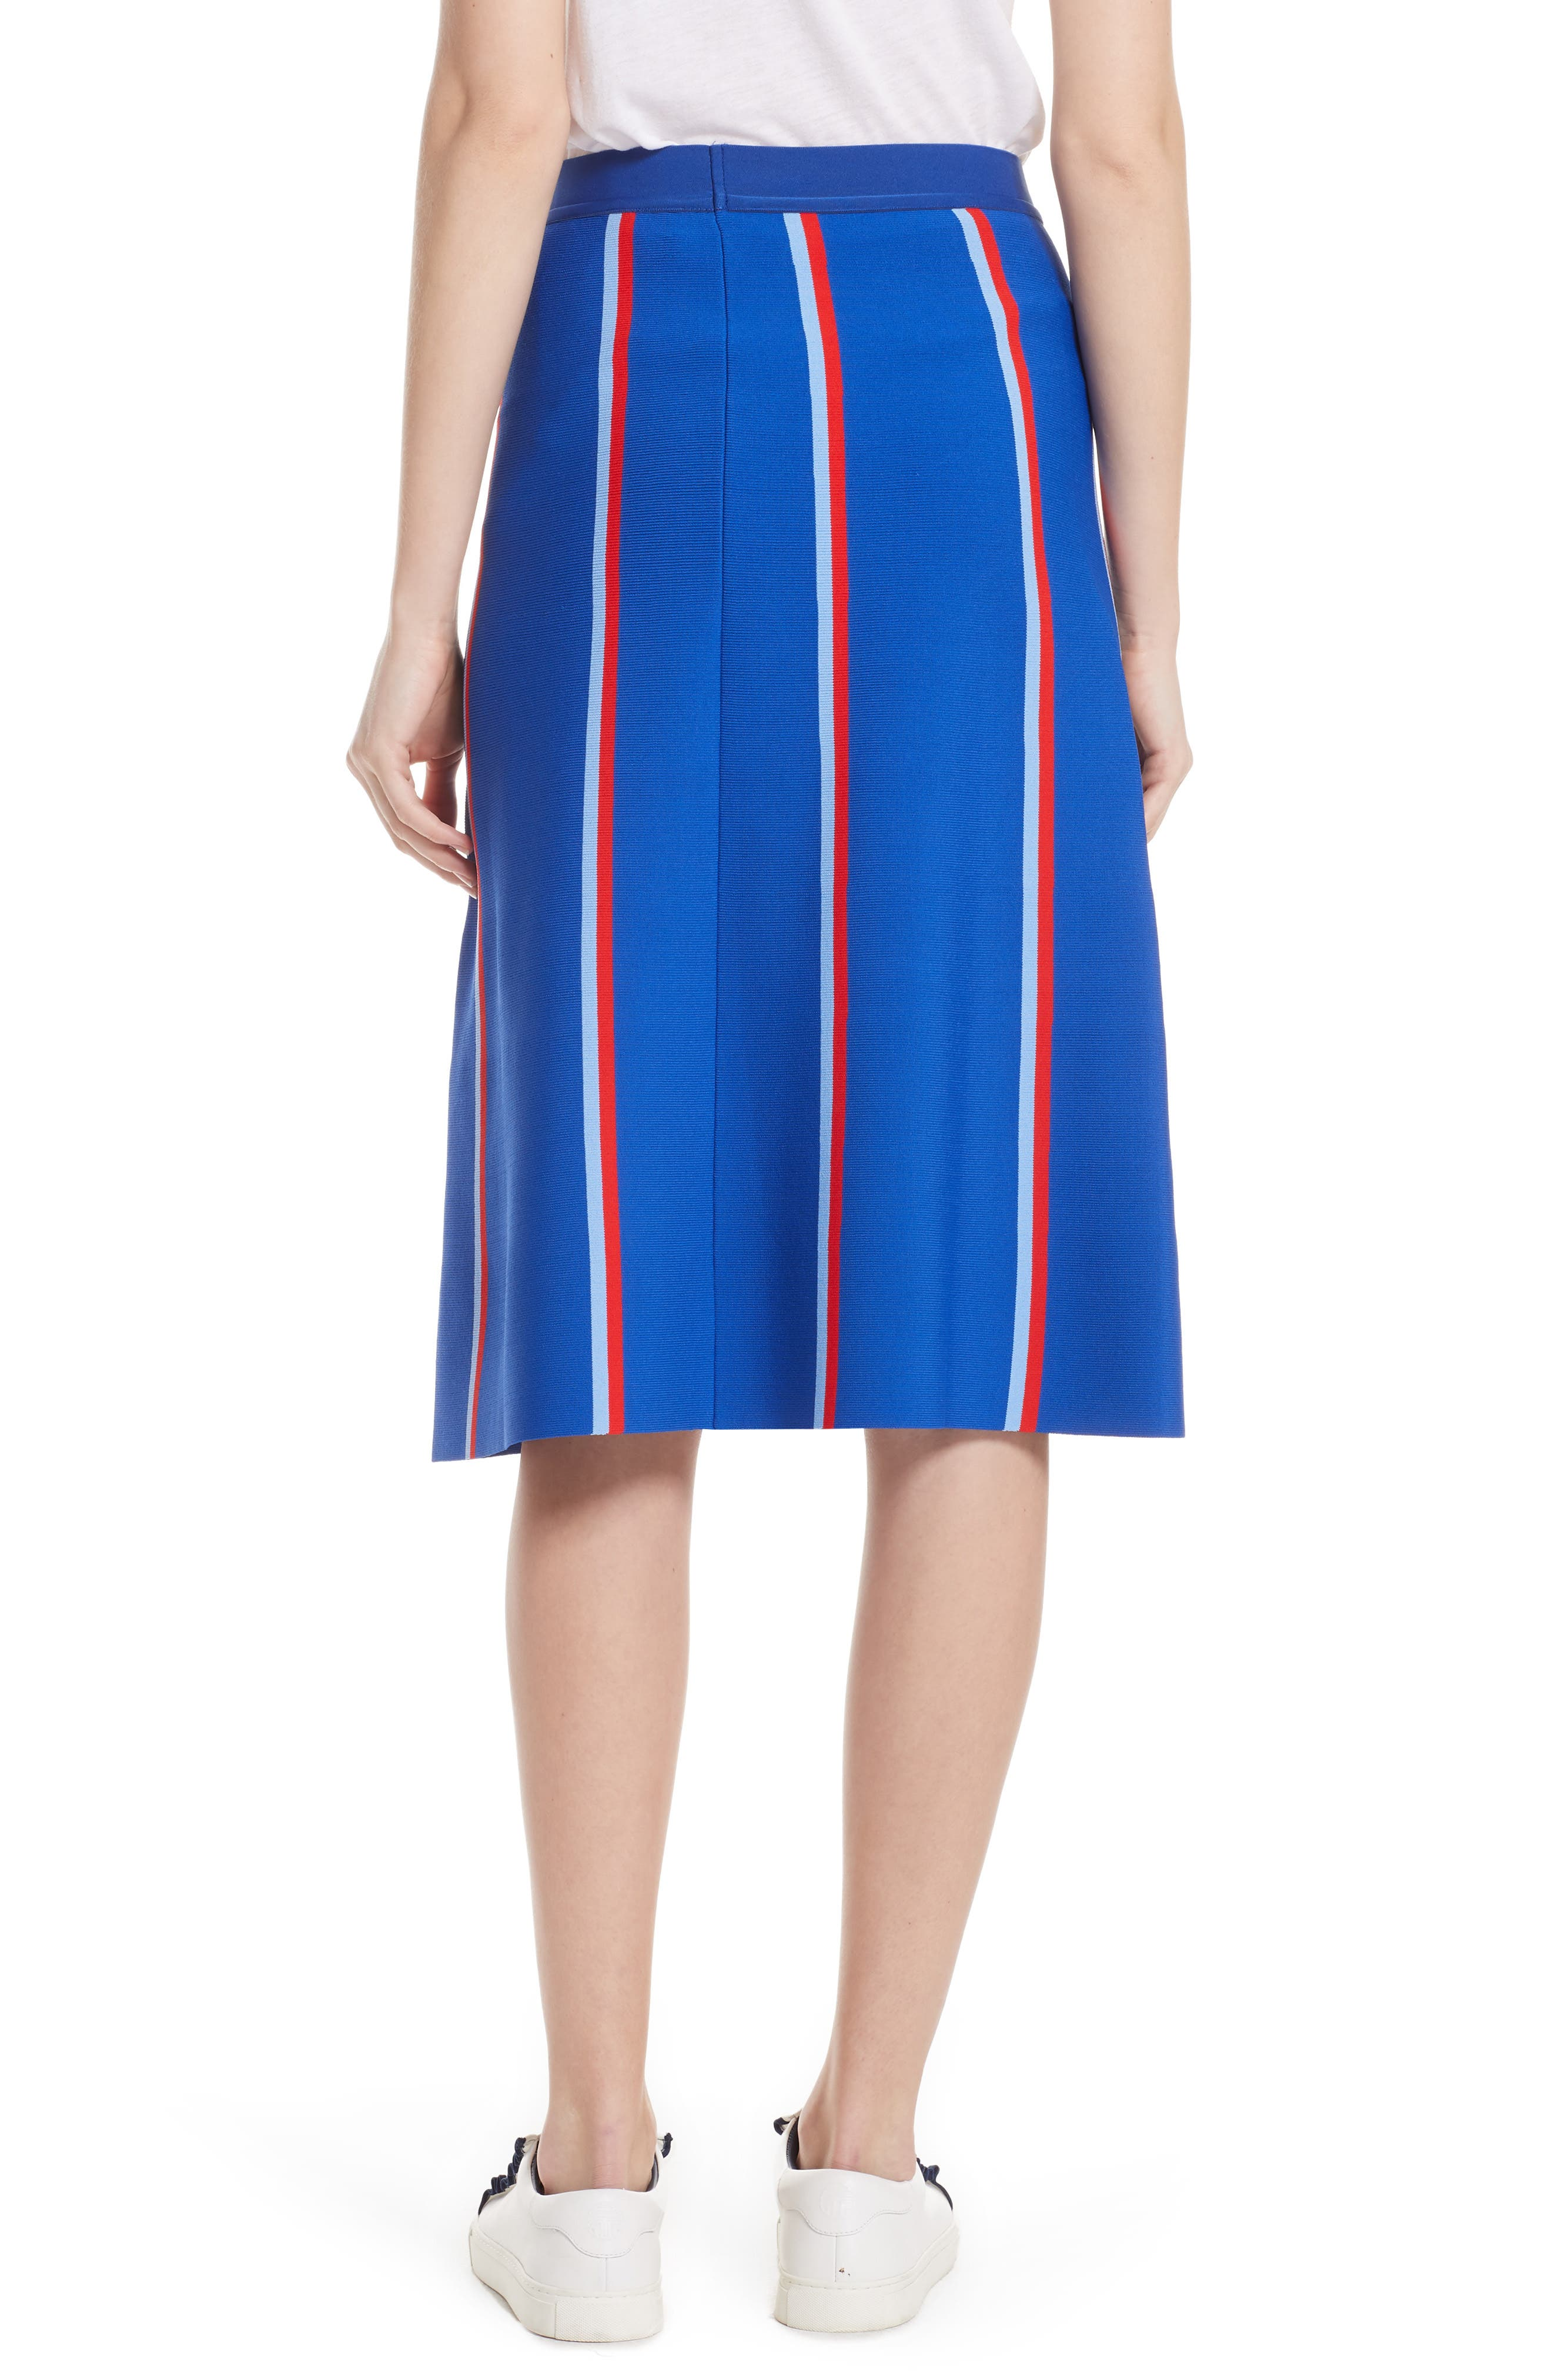 Twin Stripe Tech Knit Skirt,                             Alternate thumbnail 2, color,                             SLALOM BLUE